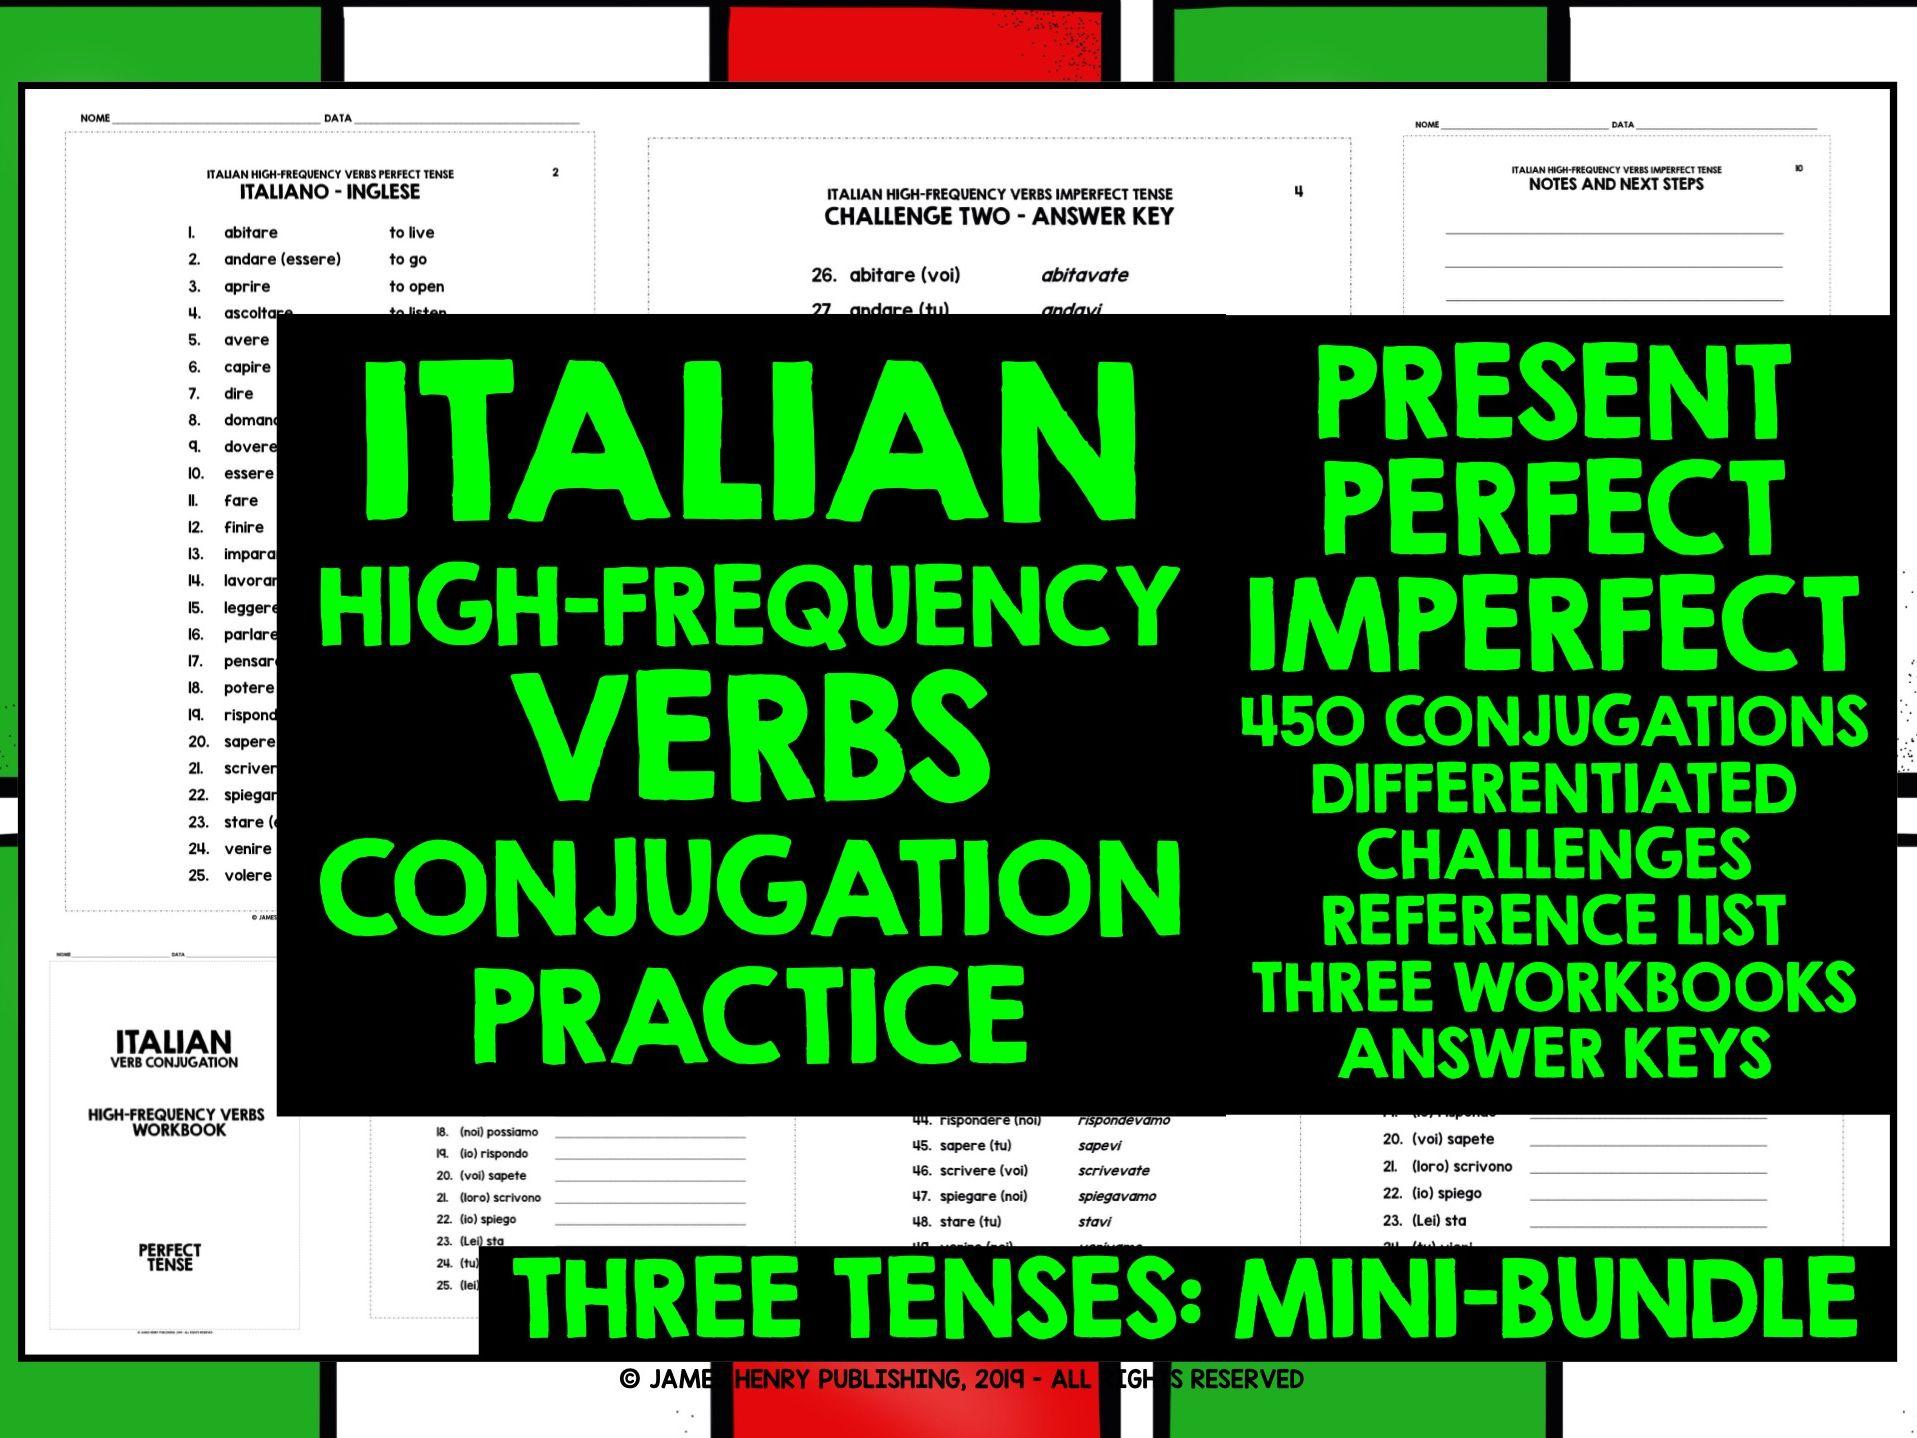 ITALIAN VERBS CONJUGATION PRACTICE MINI-BUNDLE #1